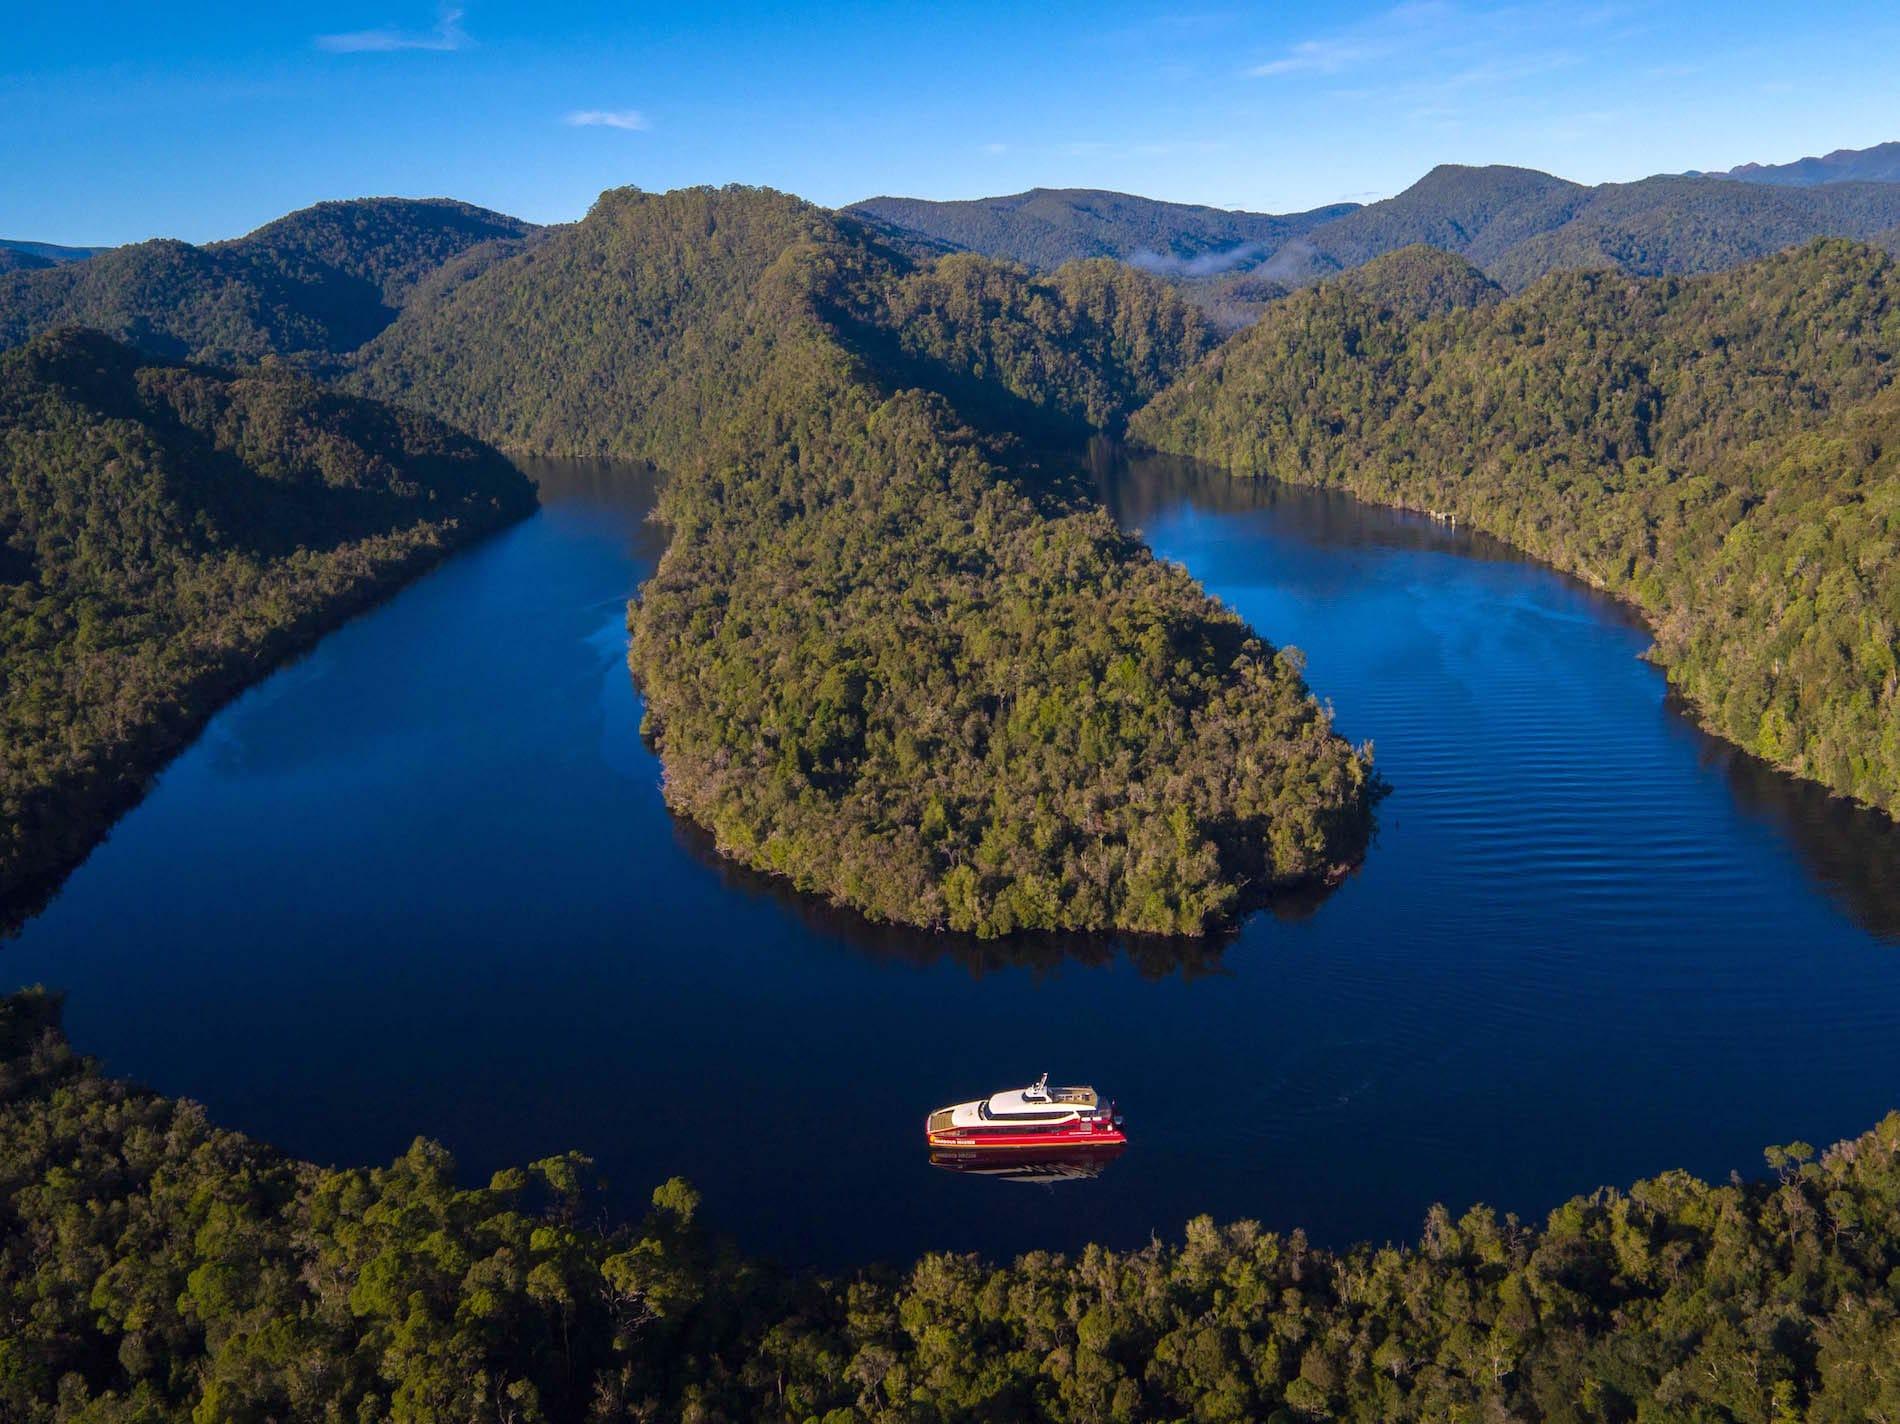 https://www.cruisinmotorhomes.com.au/wp-content/uploads/2021/03/Gordon-River-Cruise-Tasmania.jpg